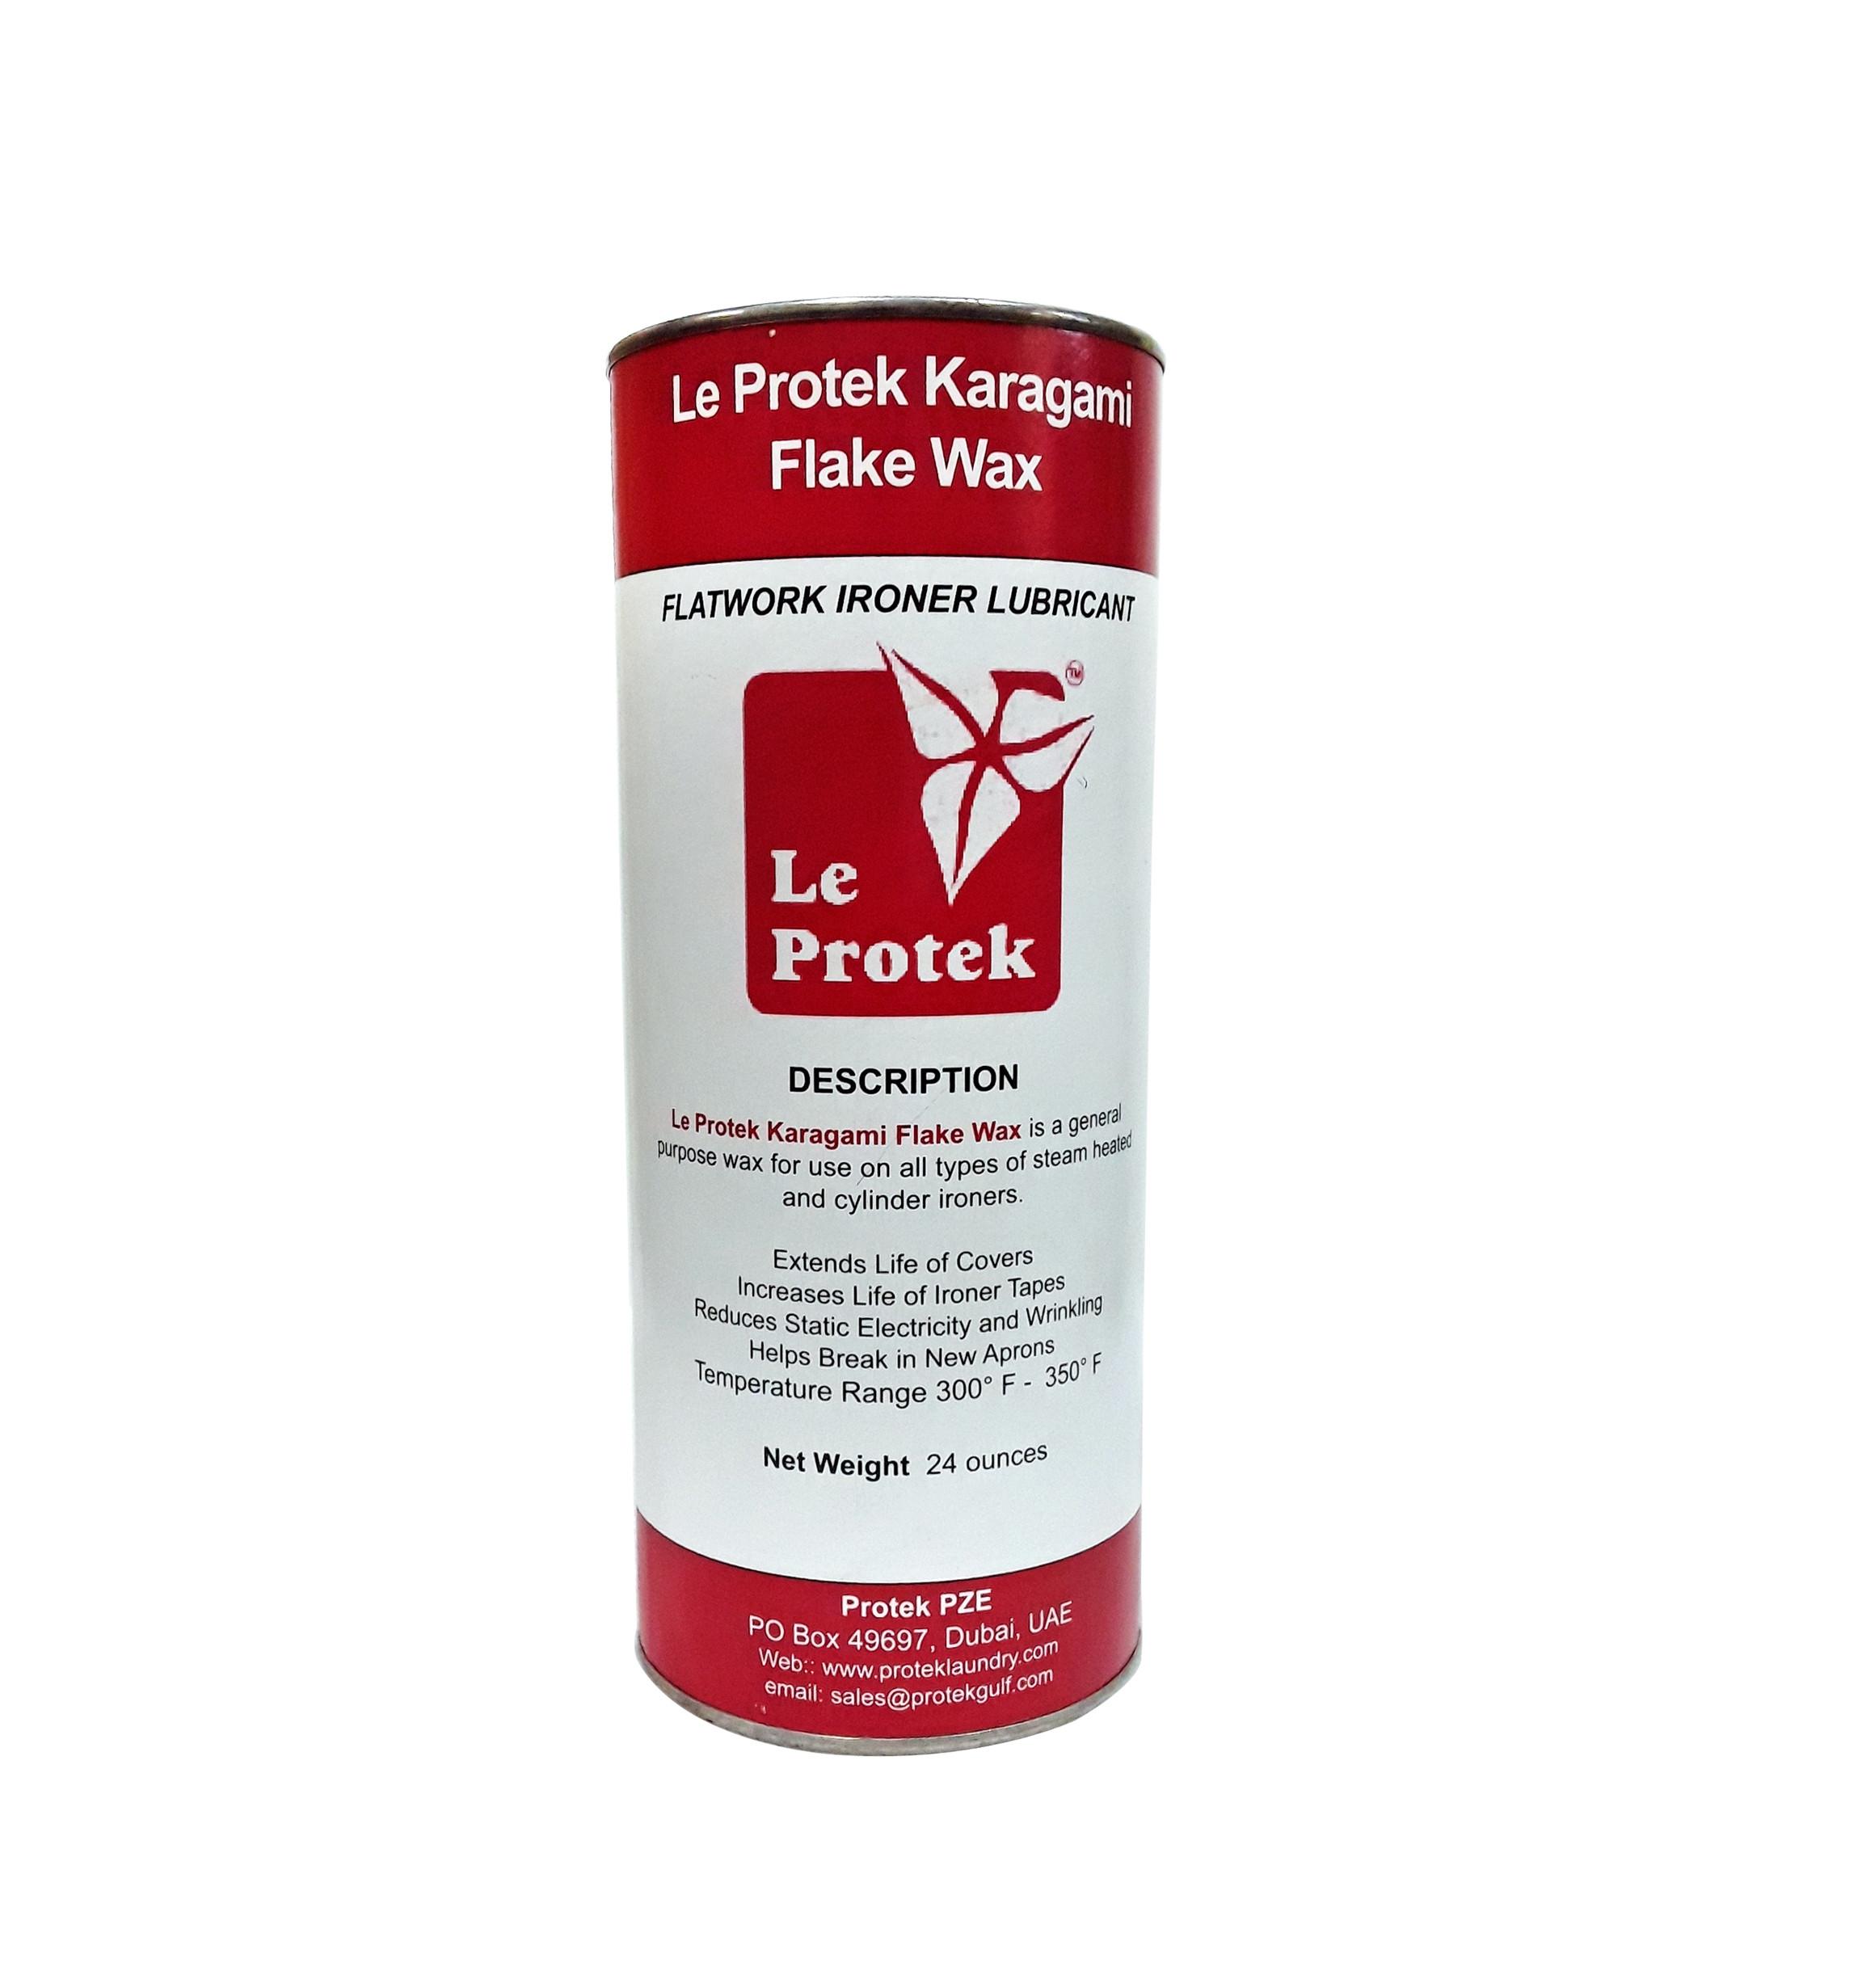 Le Protek Karagami Flake Wax